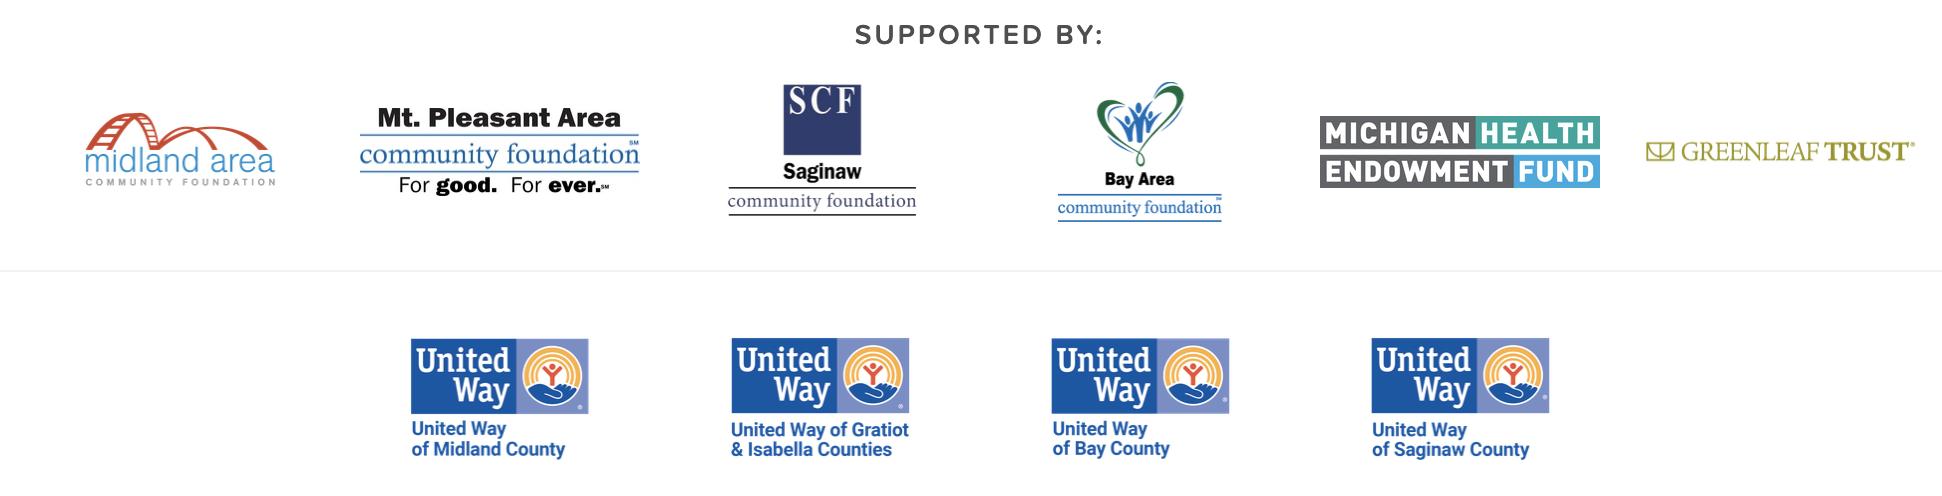 Midland Area Community Foundation